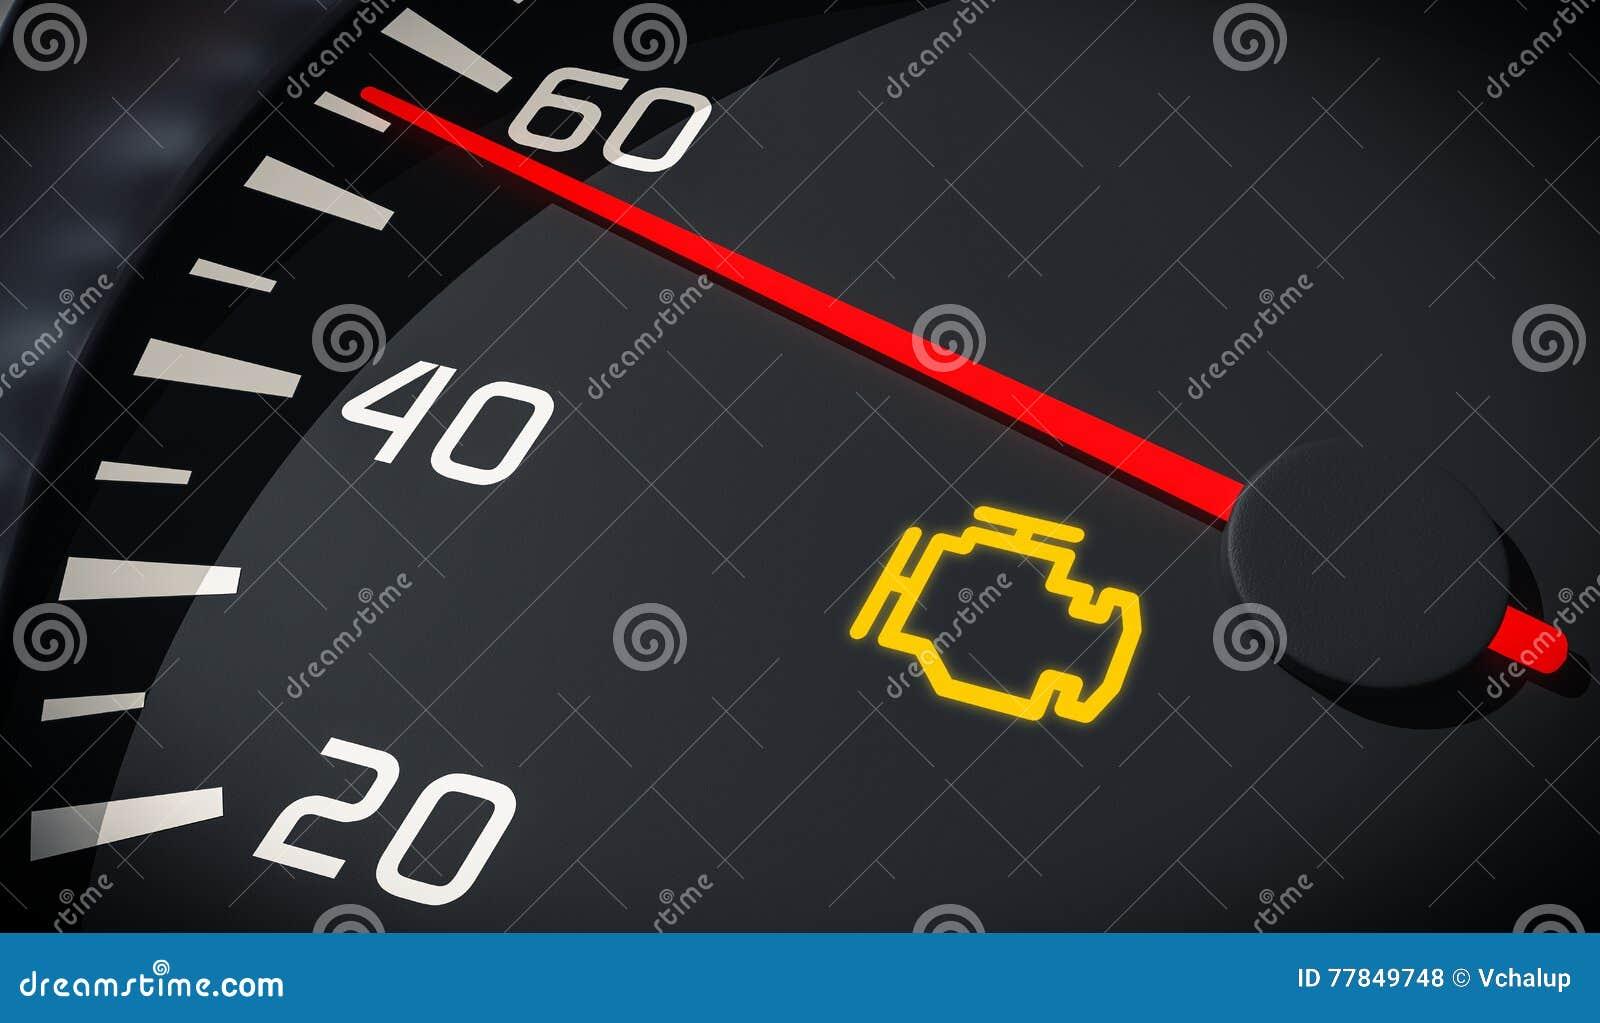 Dashboard symbols stock illustrations 156 dashboard symbols engine malfunction warning light control in car dashboard 3d rendered illustration close up view buycottarizona